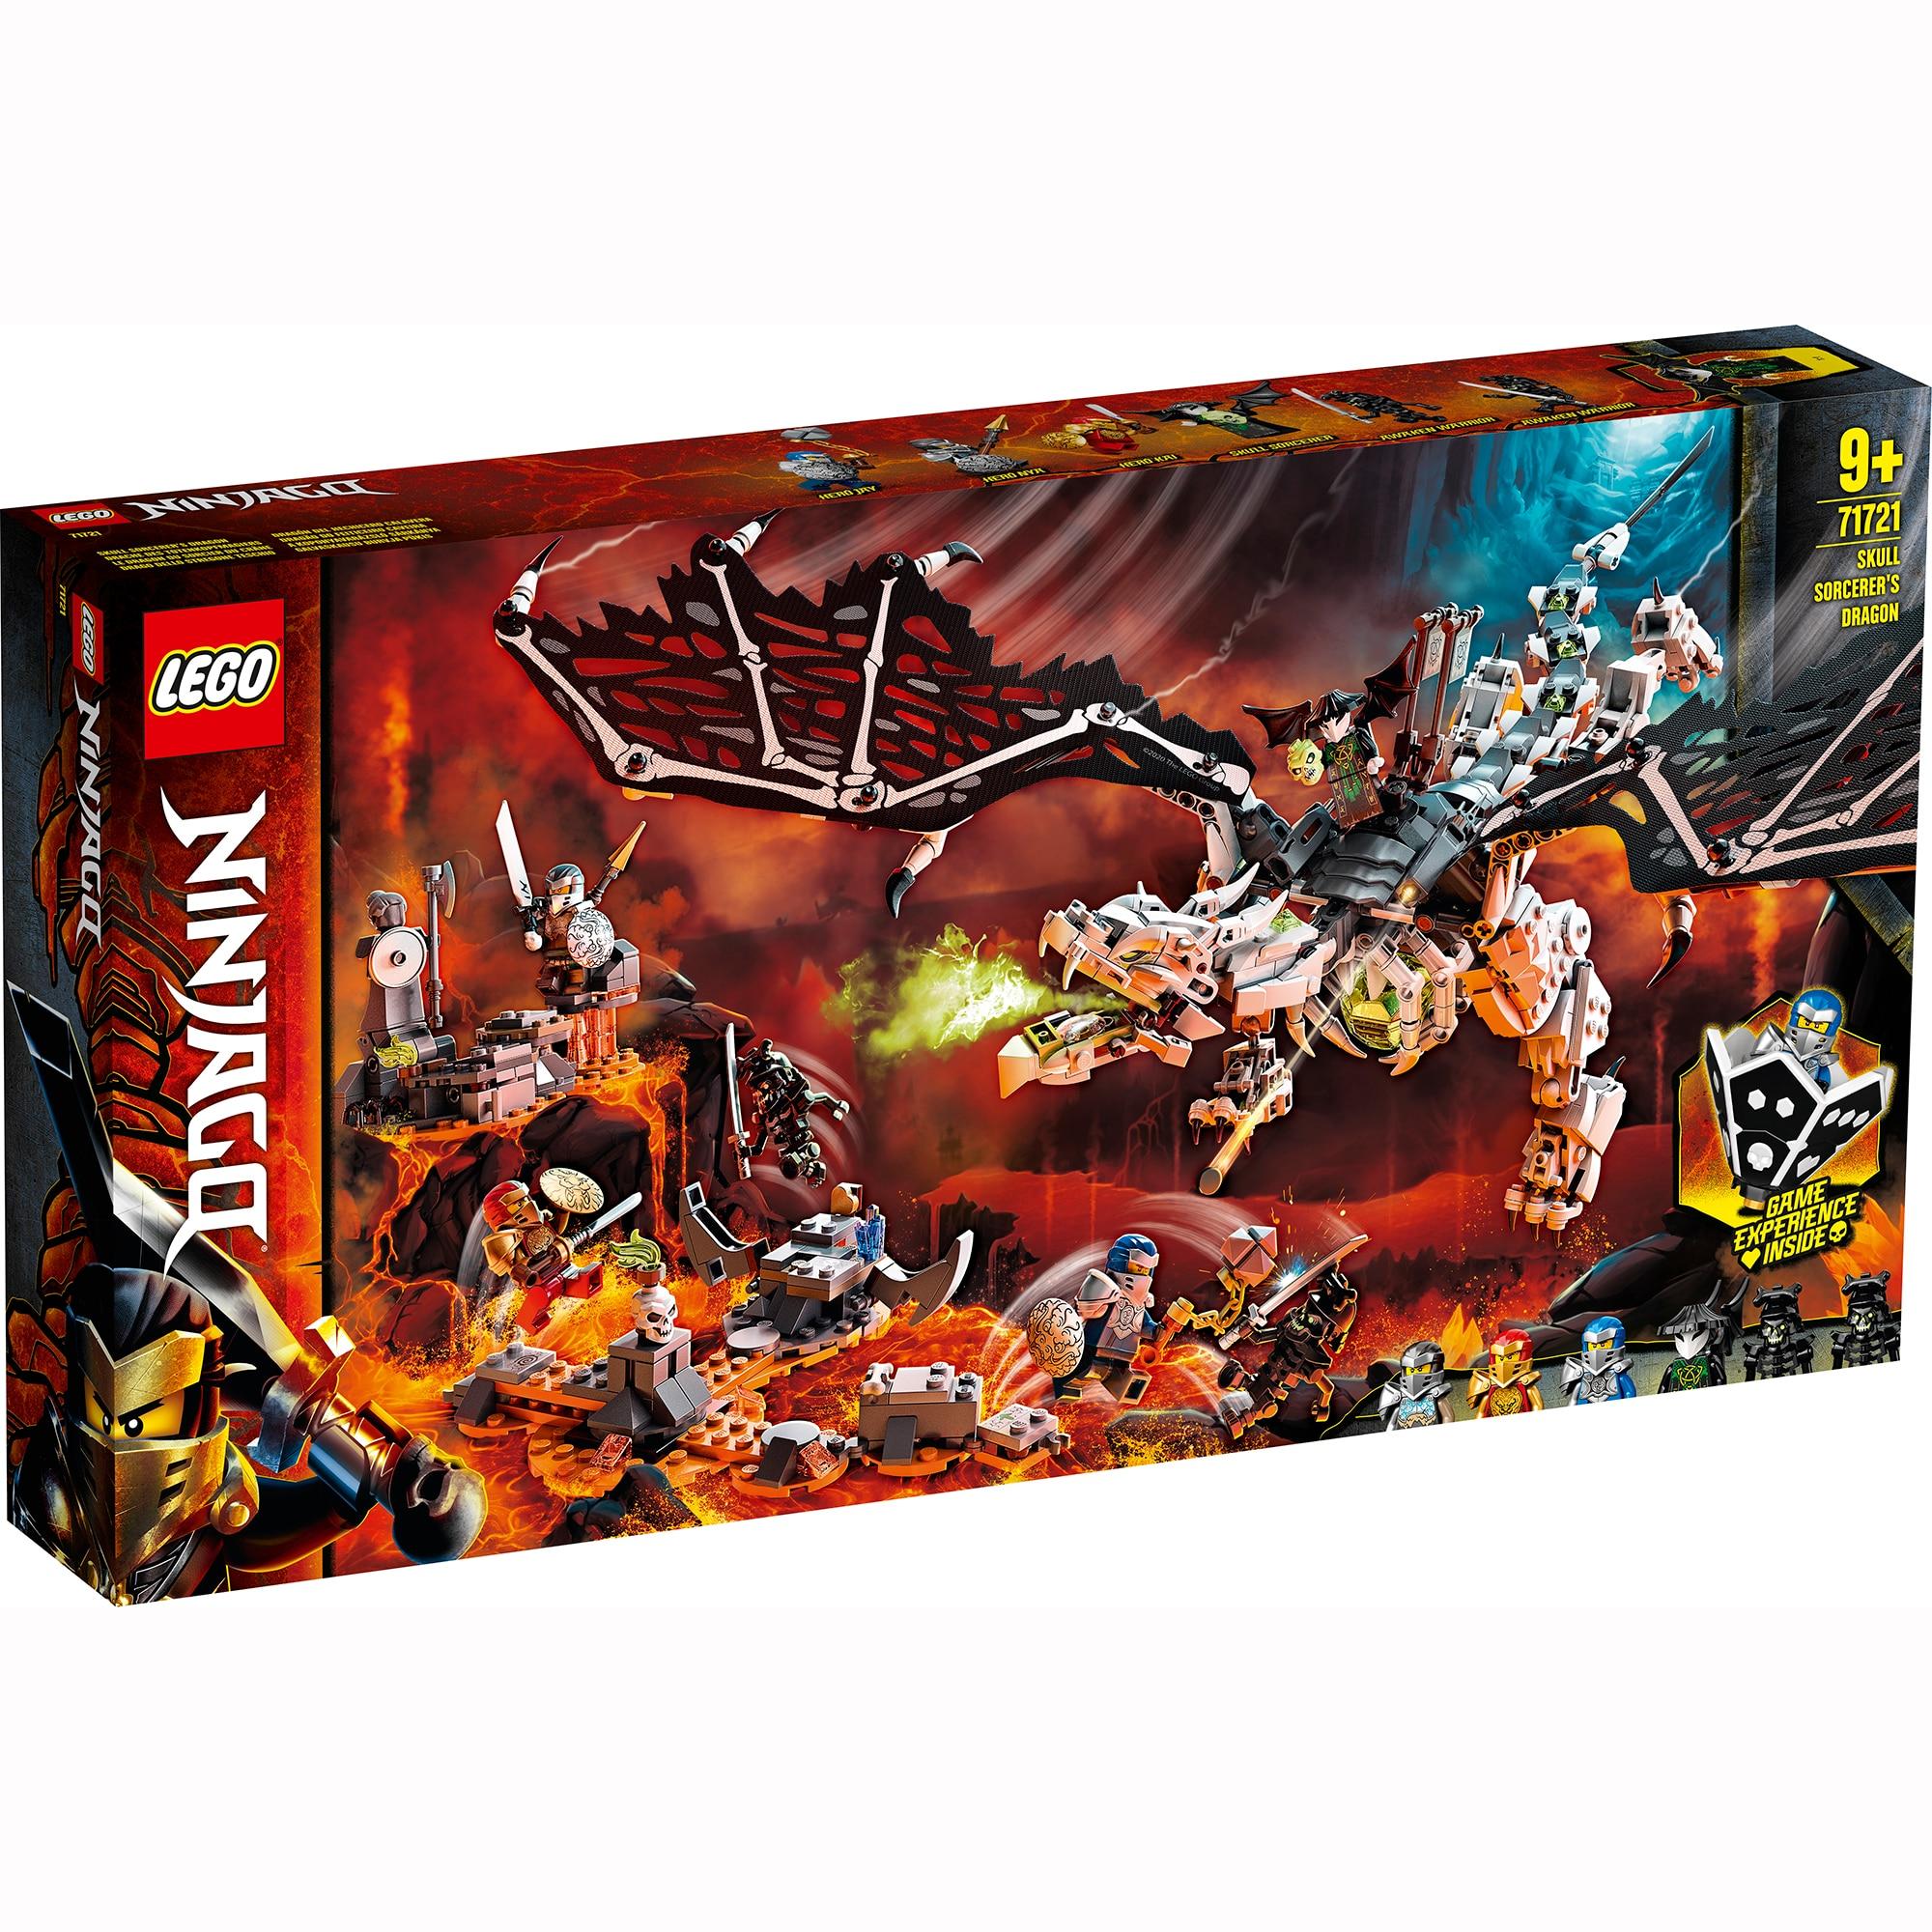 Fotografie LEGO NINJAGO - Dragonul vrajitorului Craniu 71721, 1016 piese